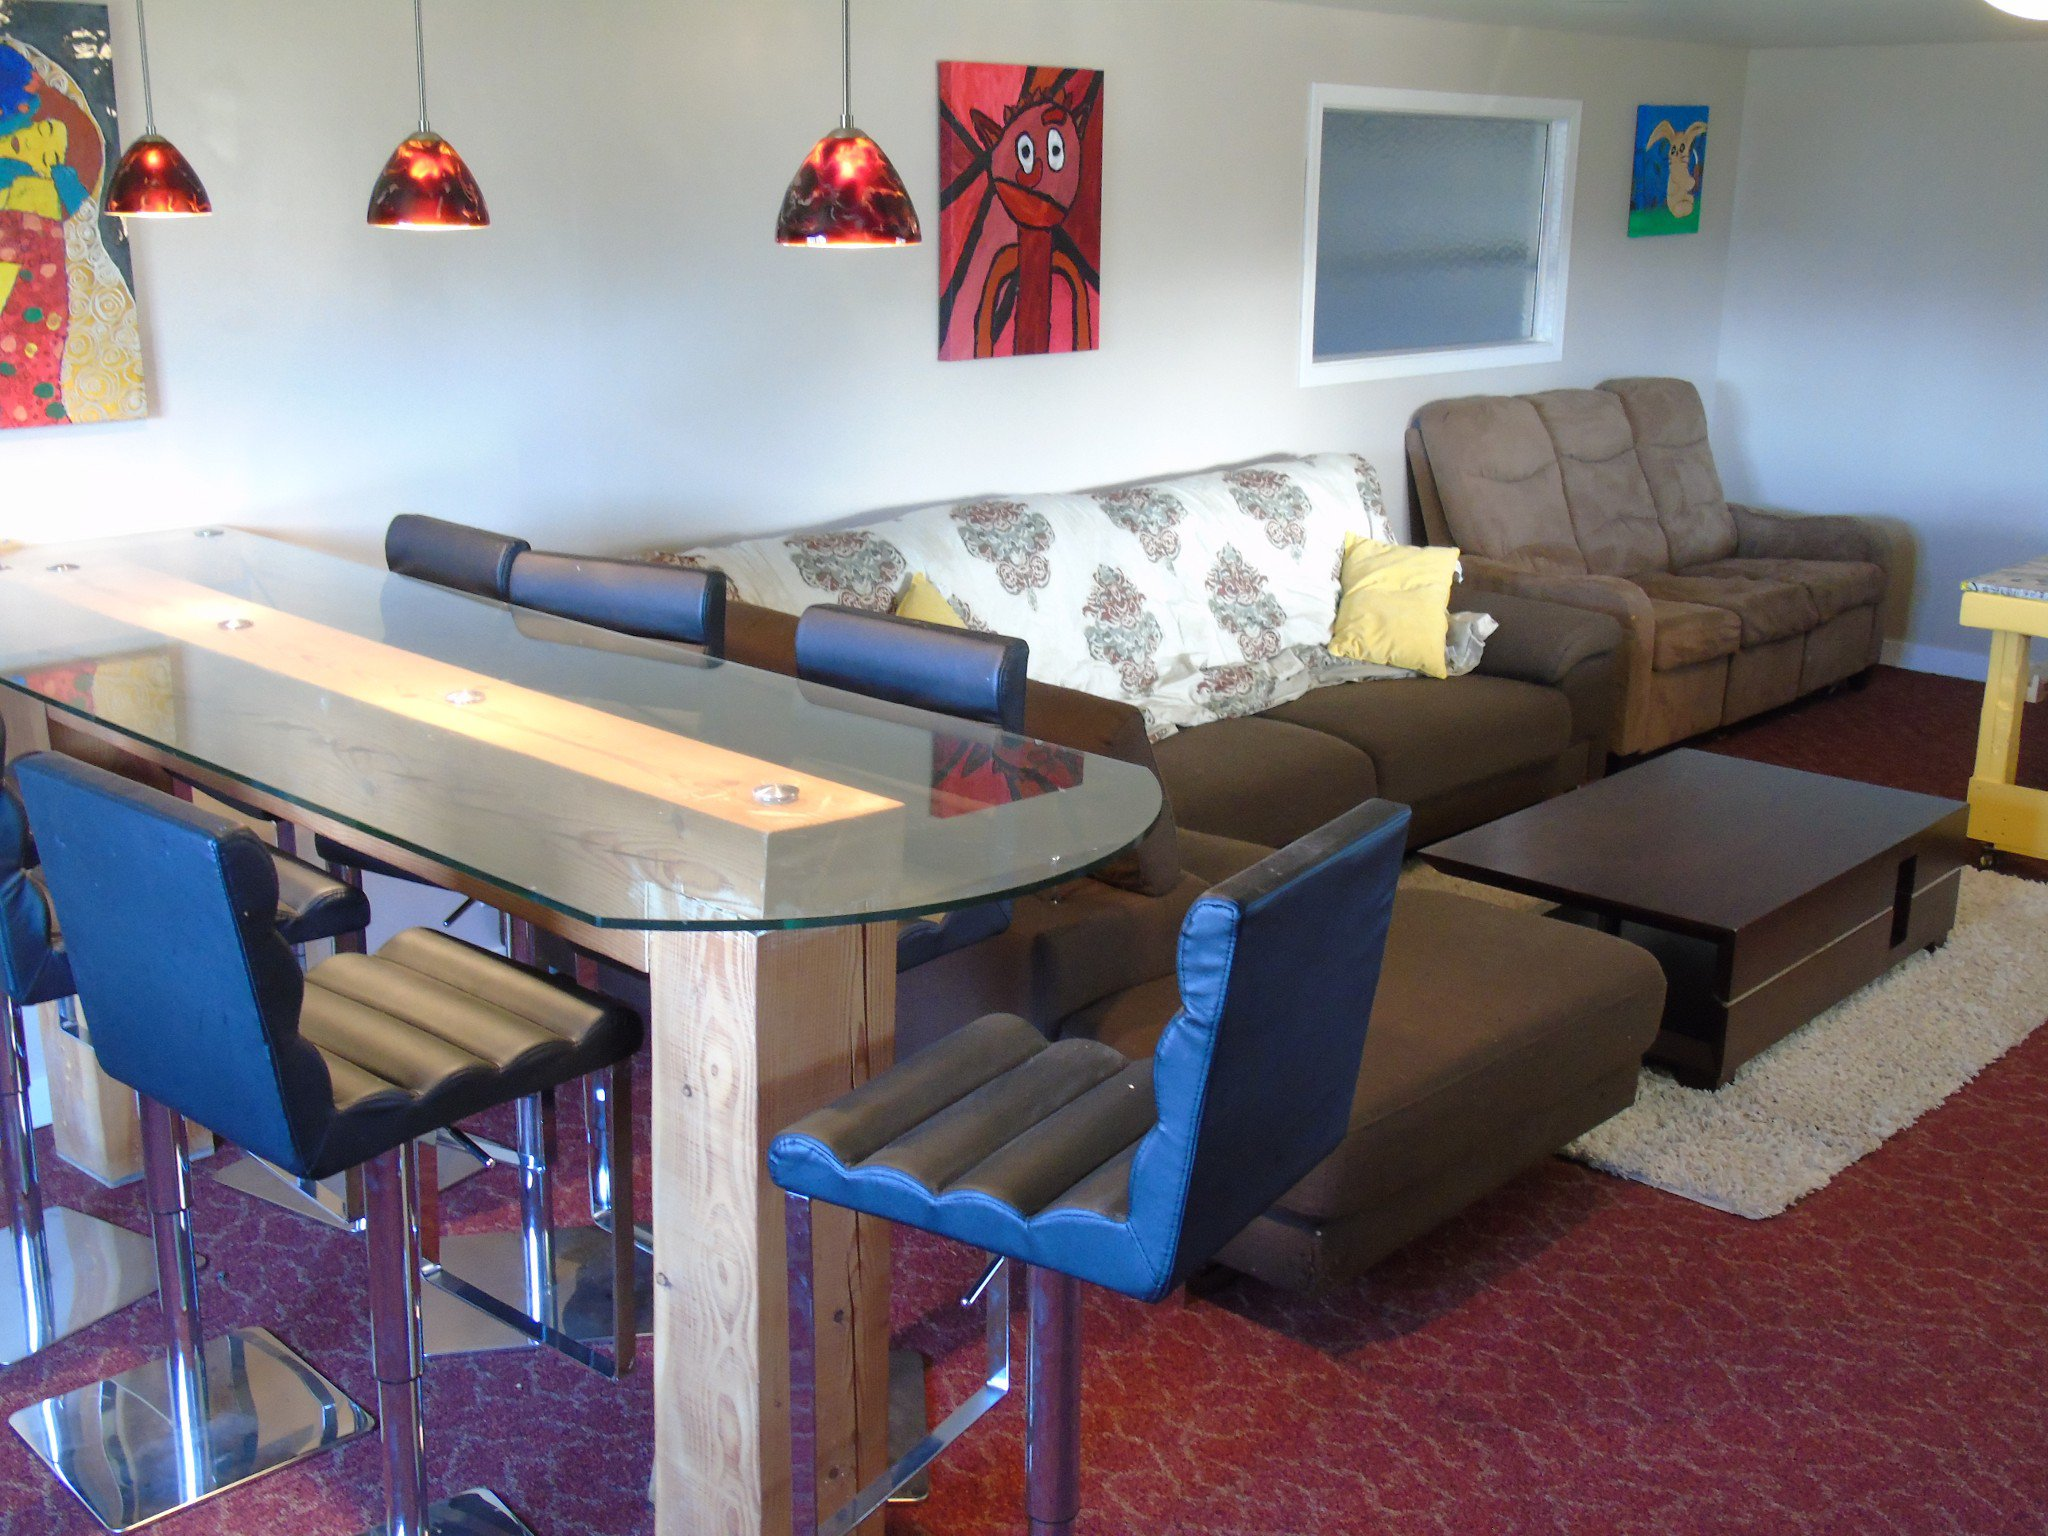 Photo 23: Photos: 6490 Barnhartvale Road in Kamloops: Barnhartvale House for sale : MLS®# New